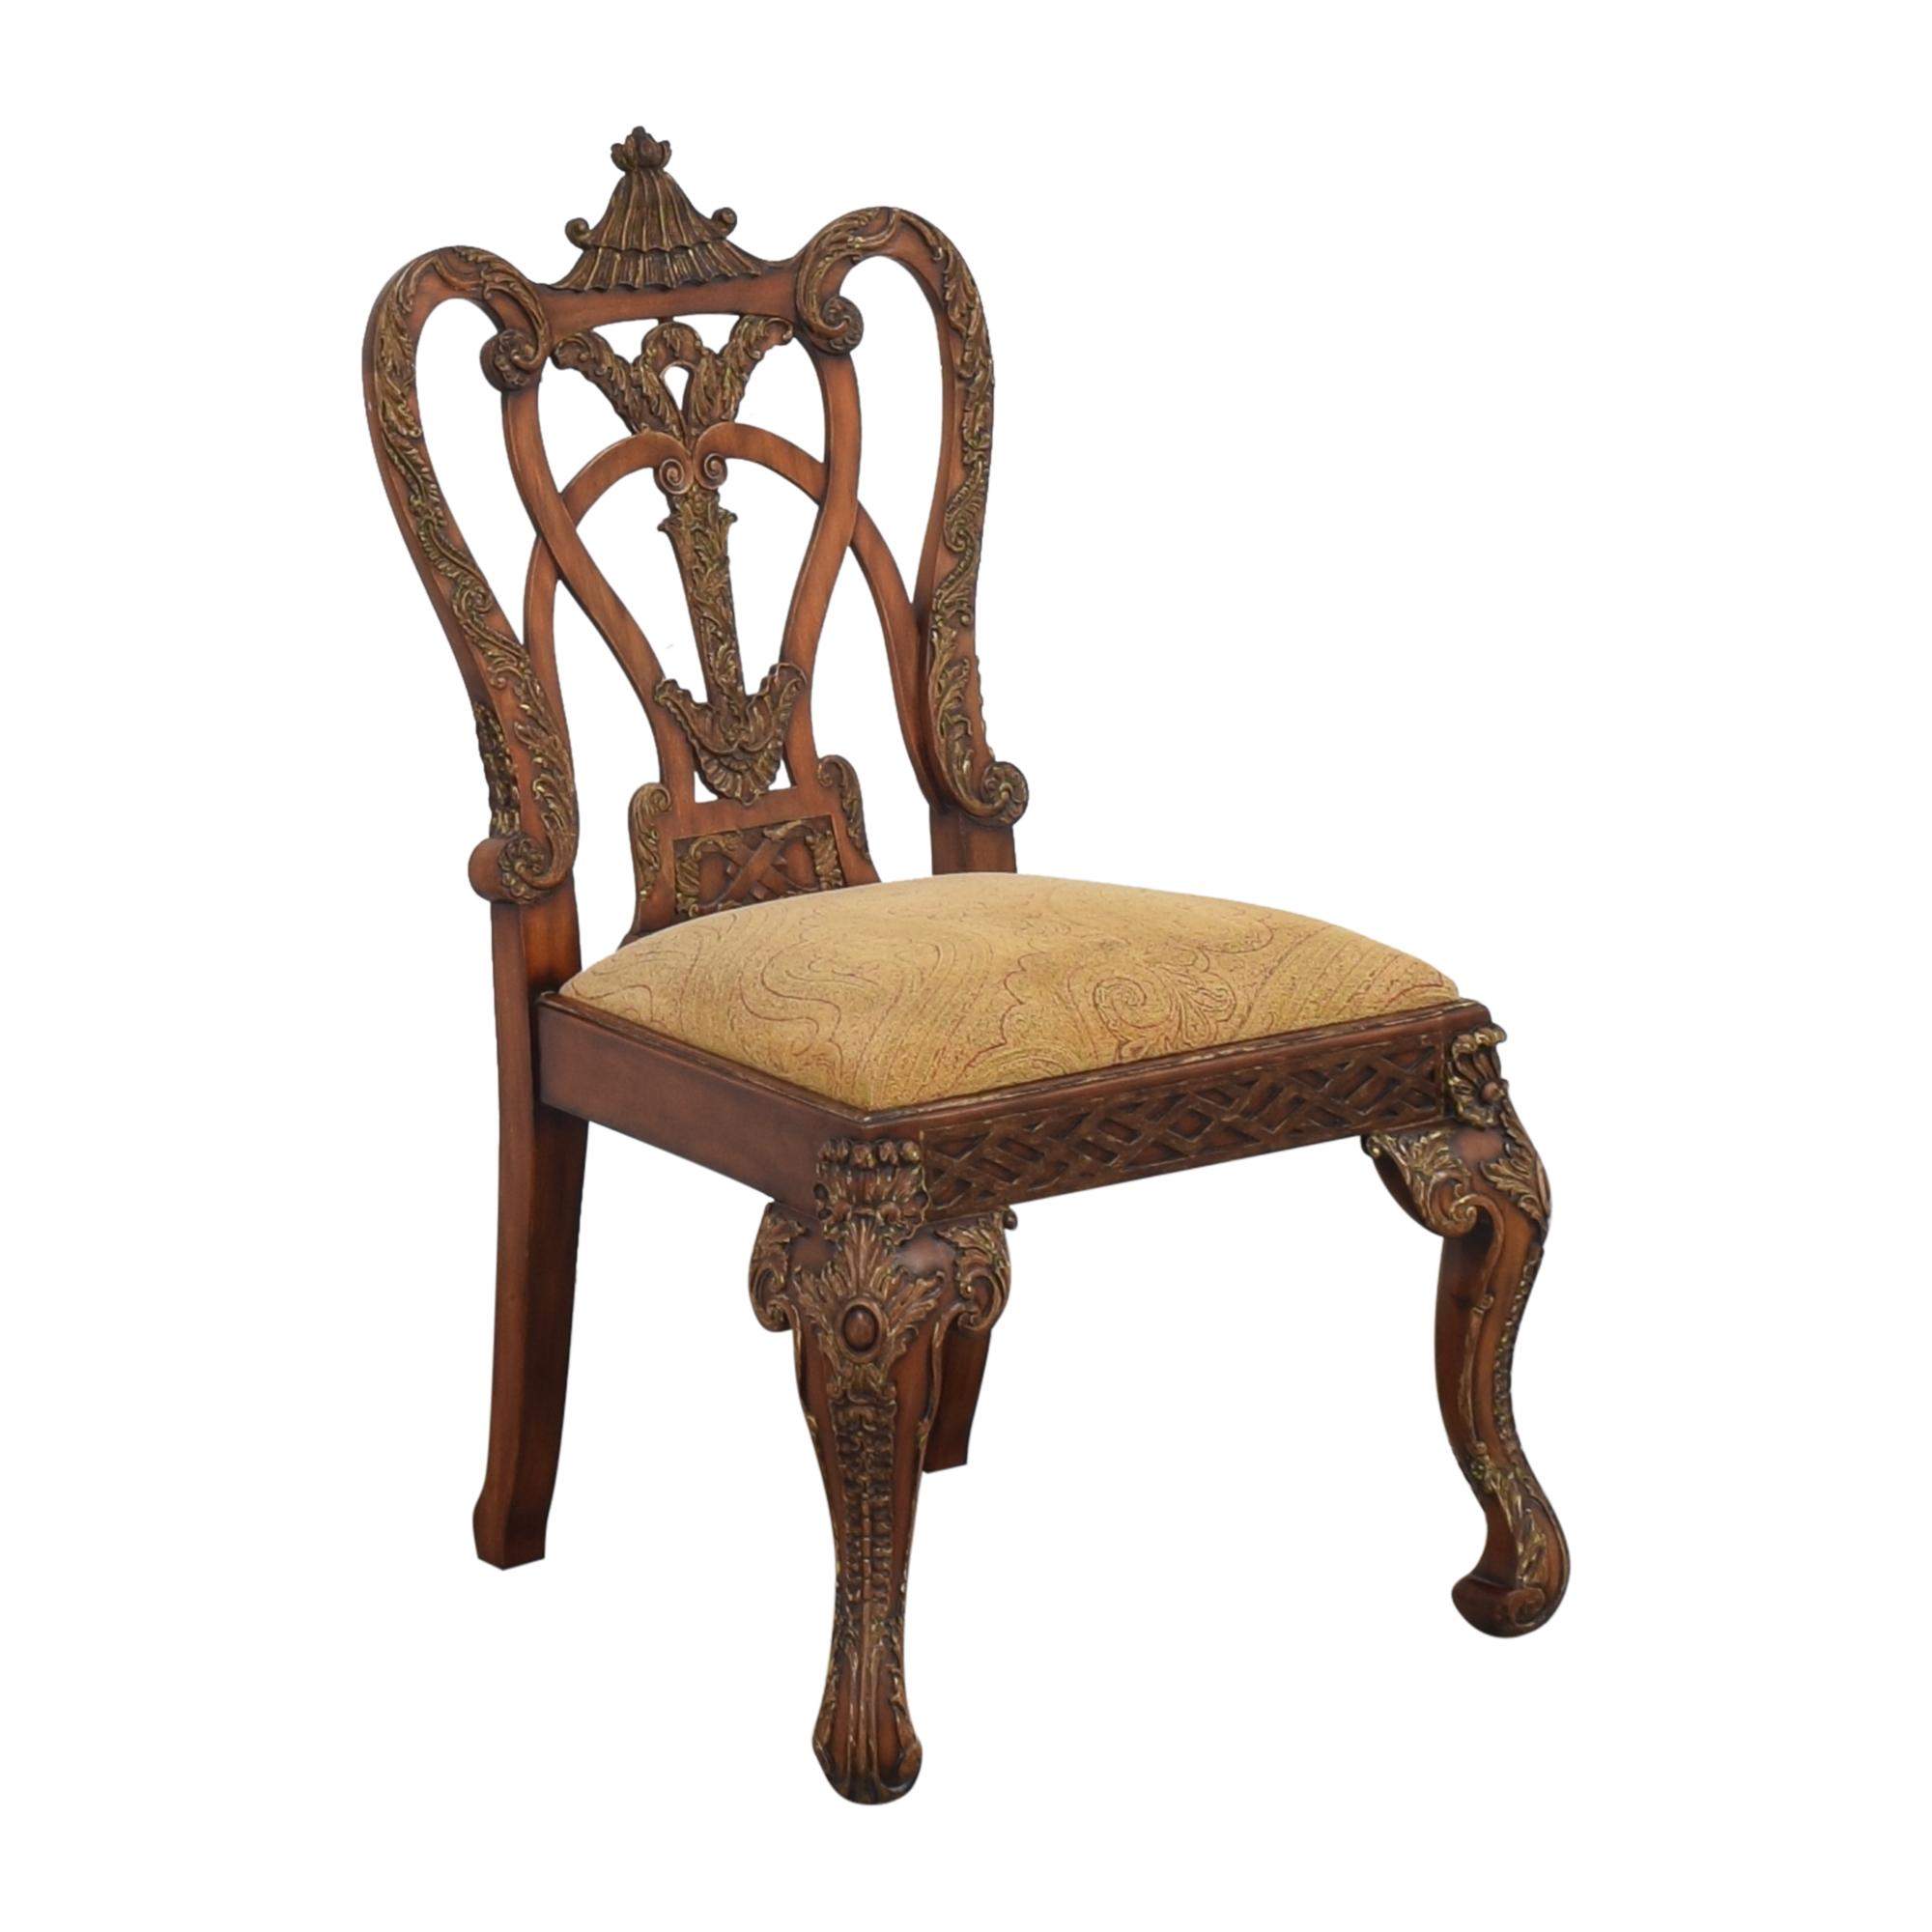 shop Maitland-Smith Maitland-Smith Decorative Dining Chair online